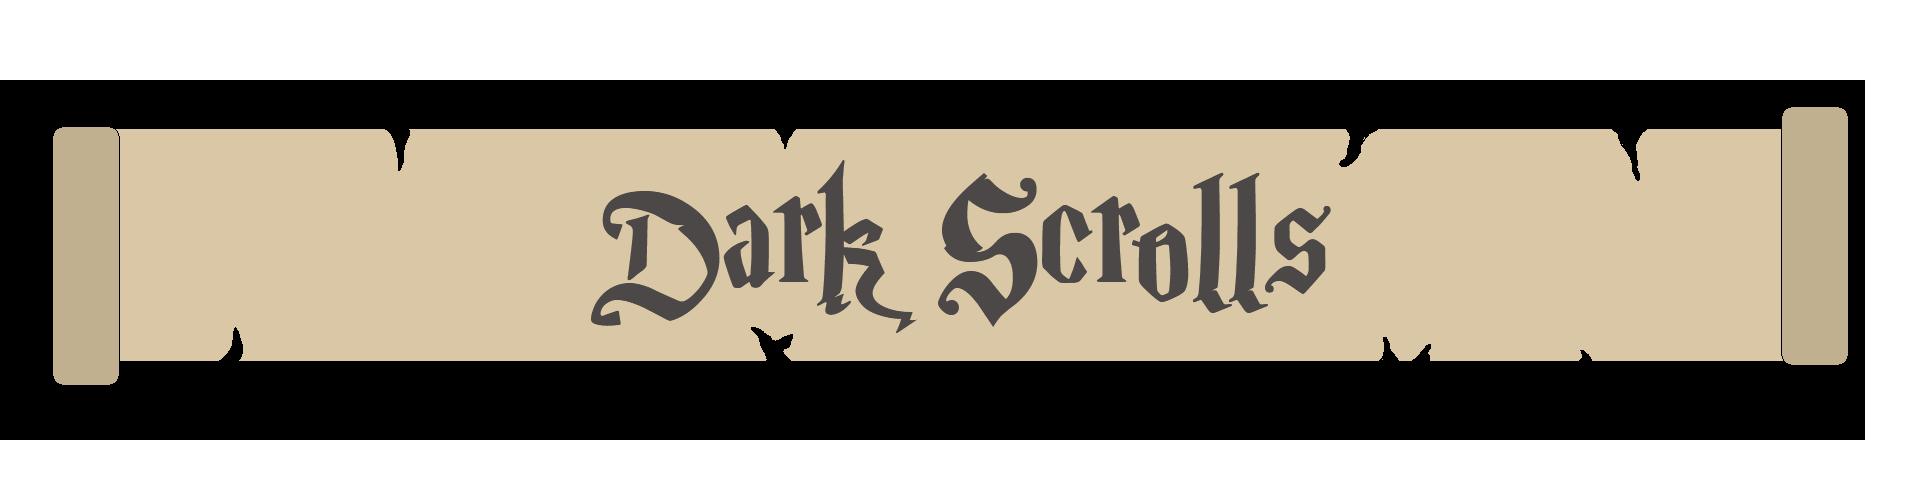 Dark Scroll